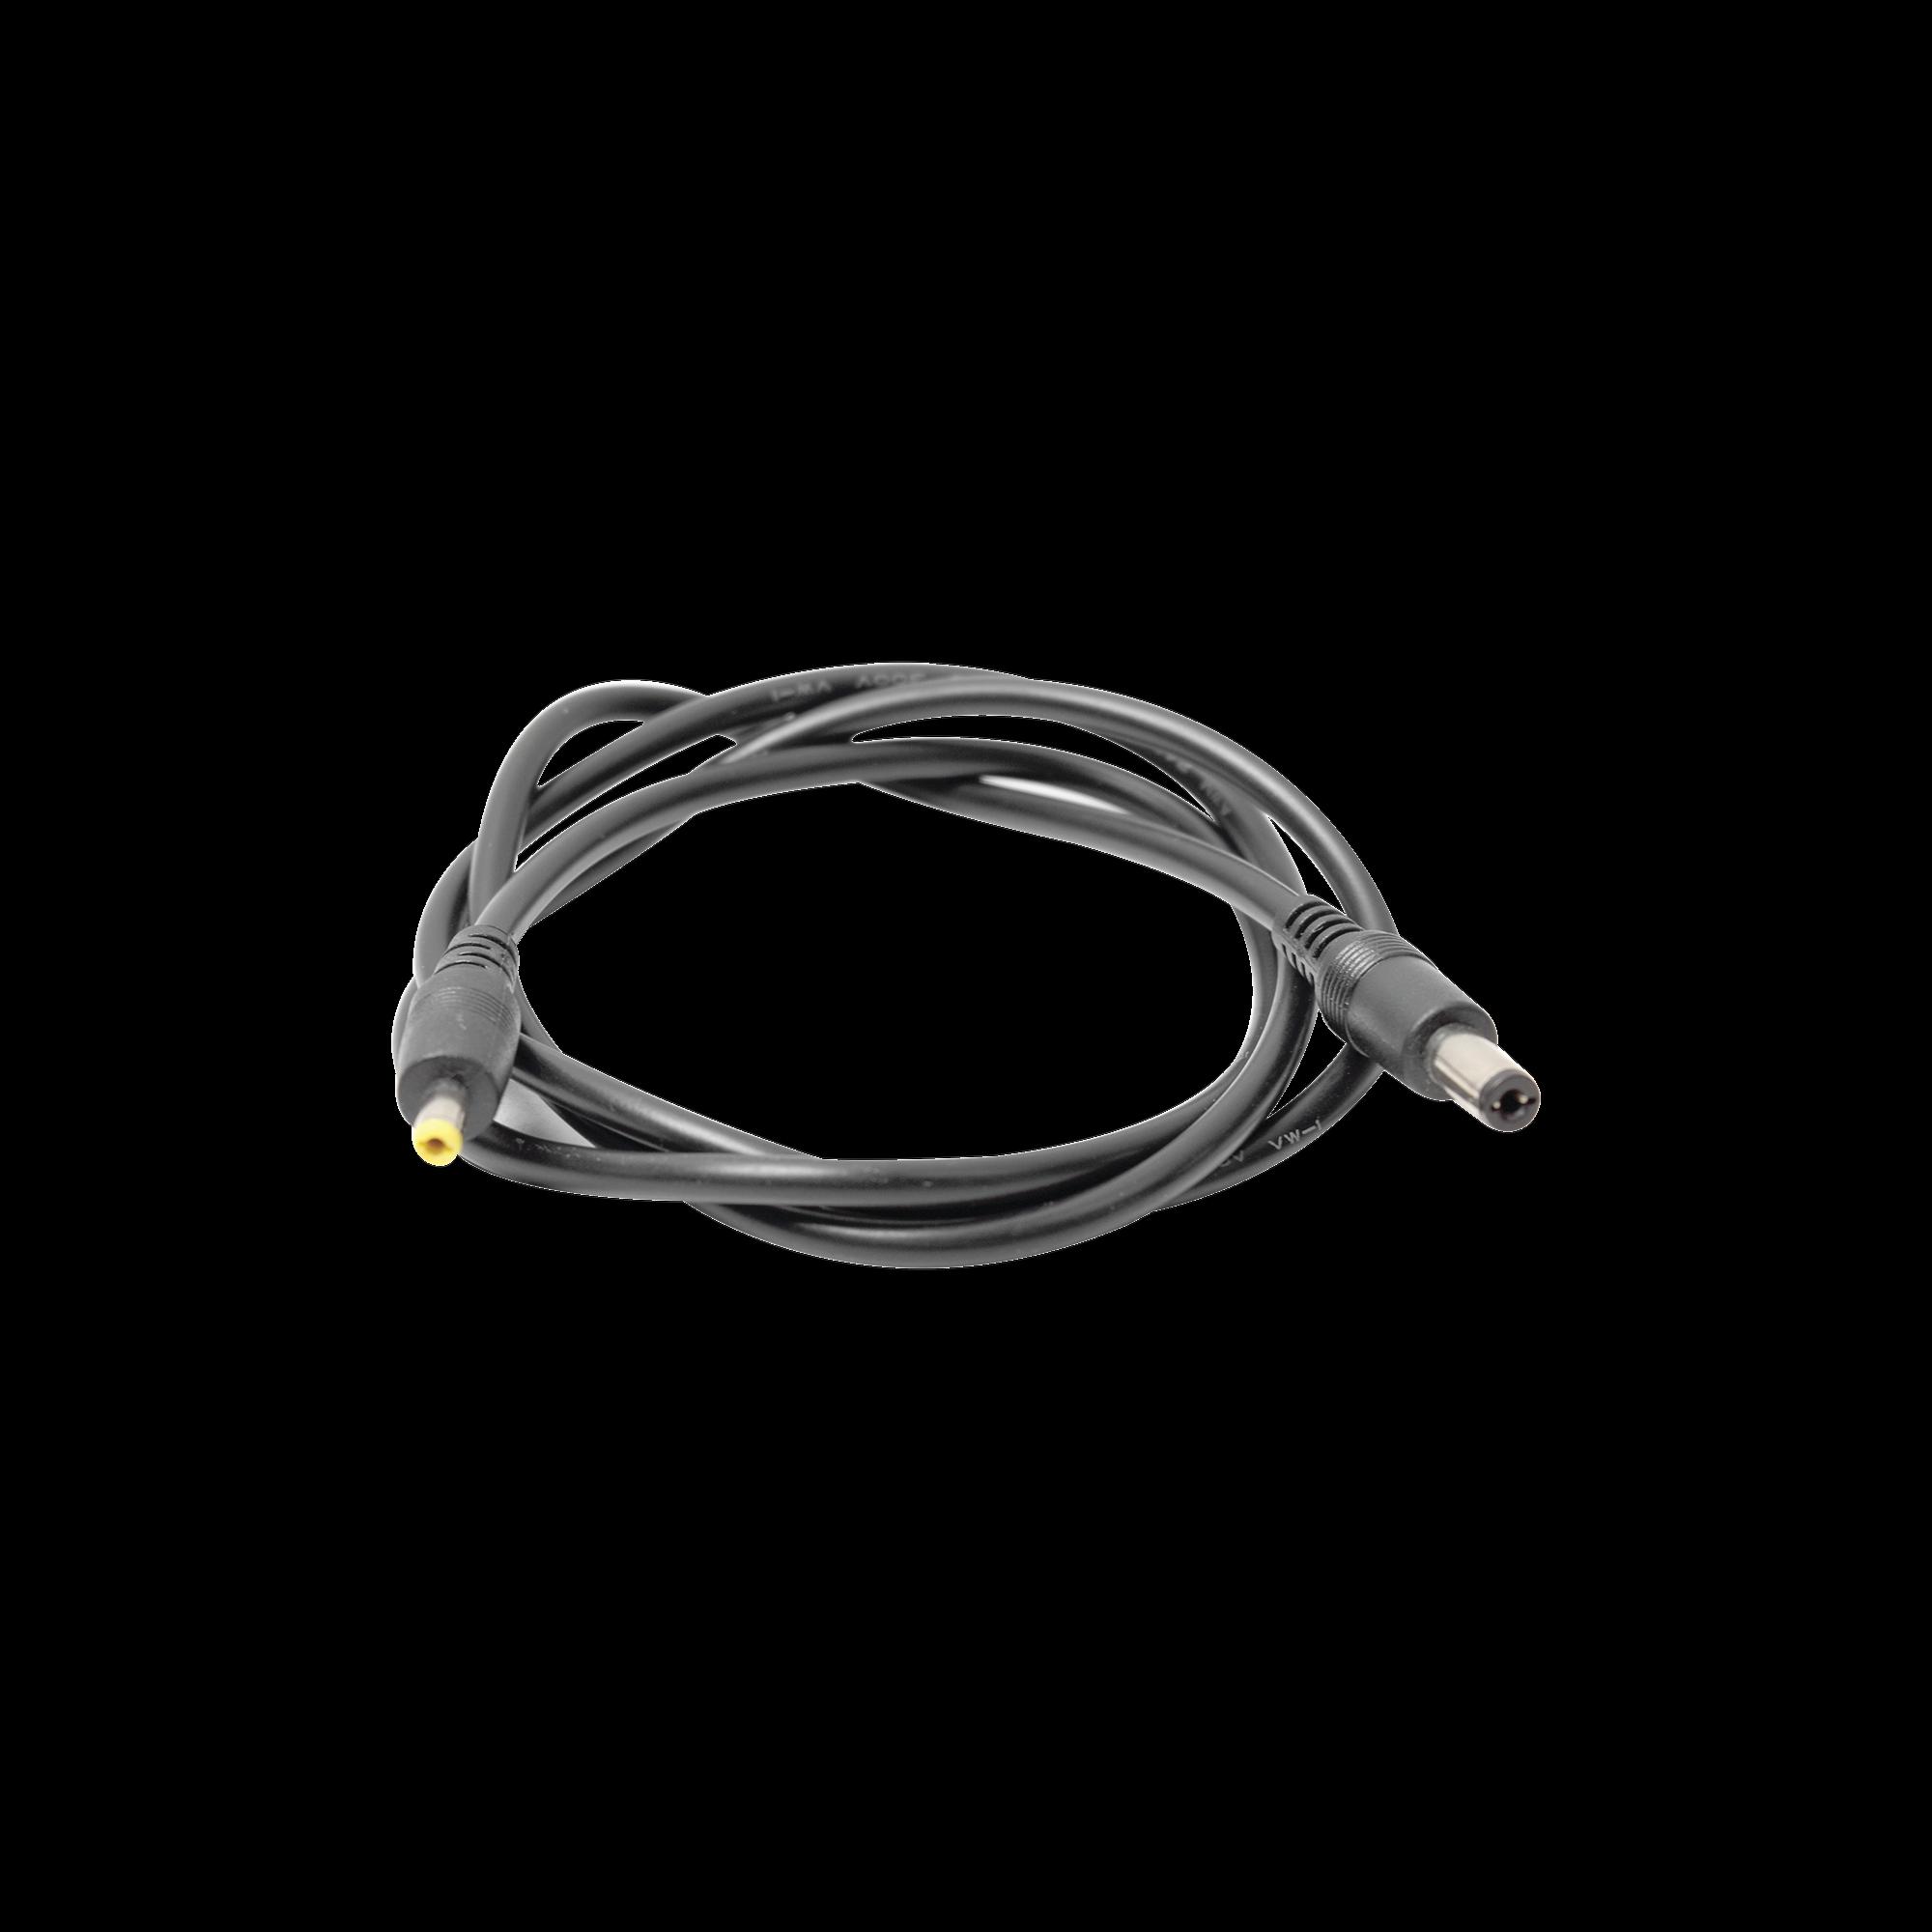 Cable de alimentacion de camara a traves de tester EPMONTVI/3.0 & TPTURBOHD & TPTURBO8MP